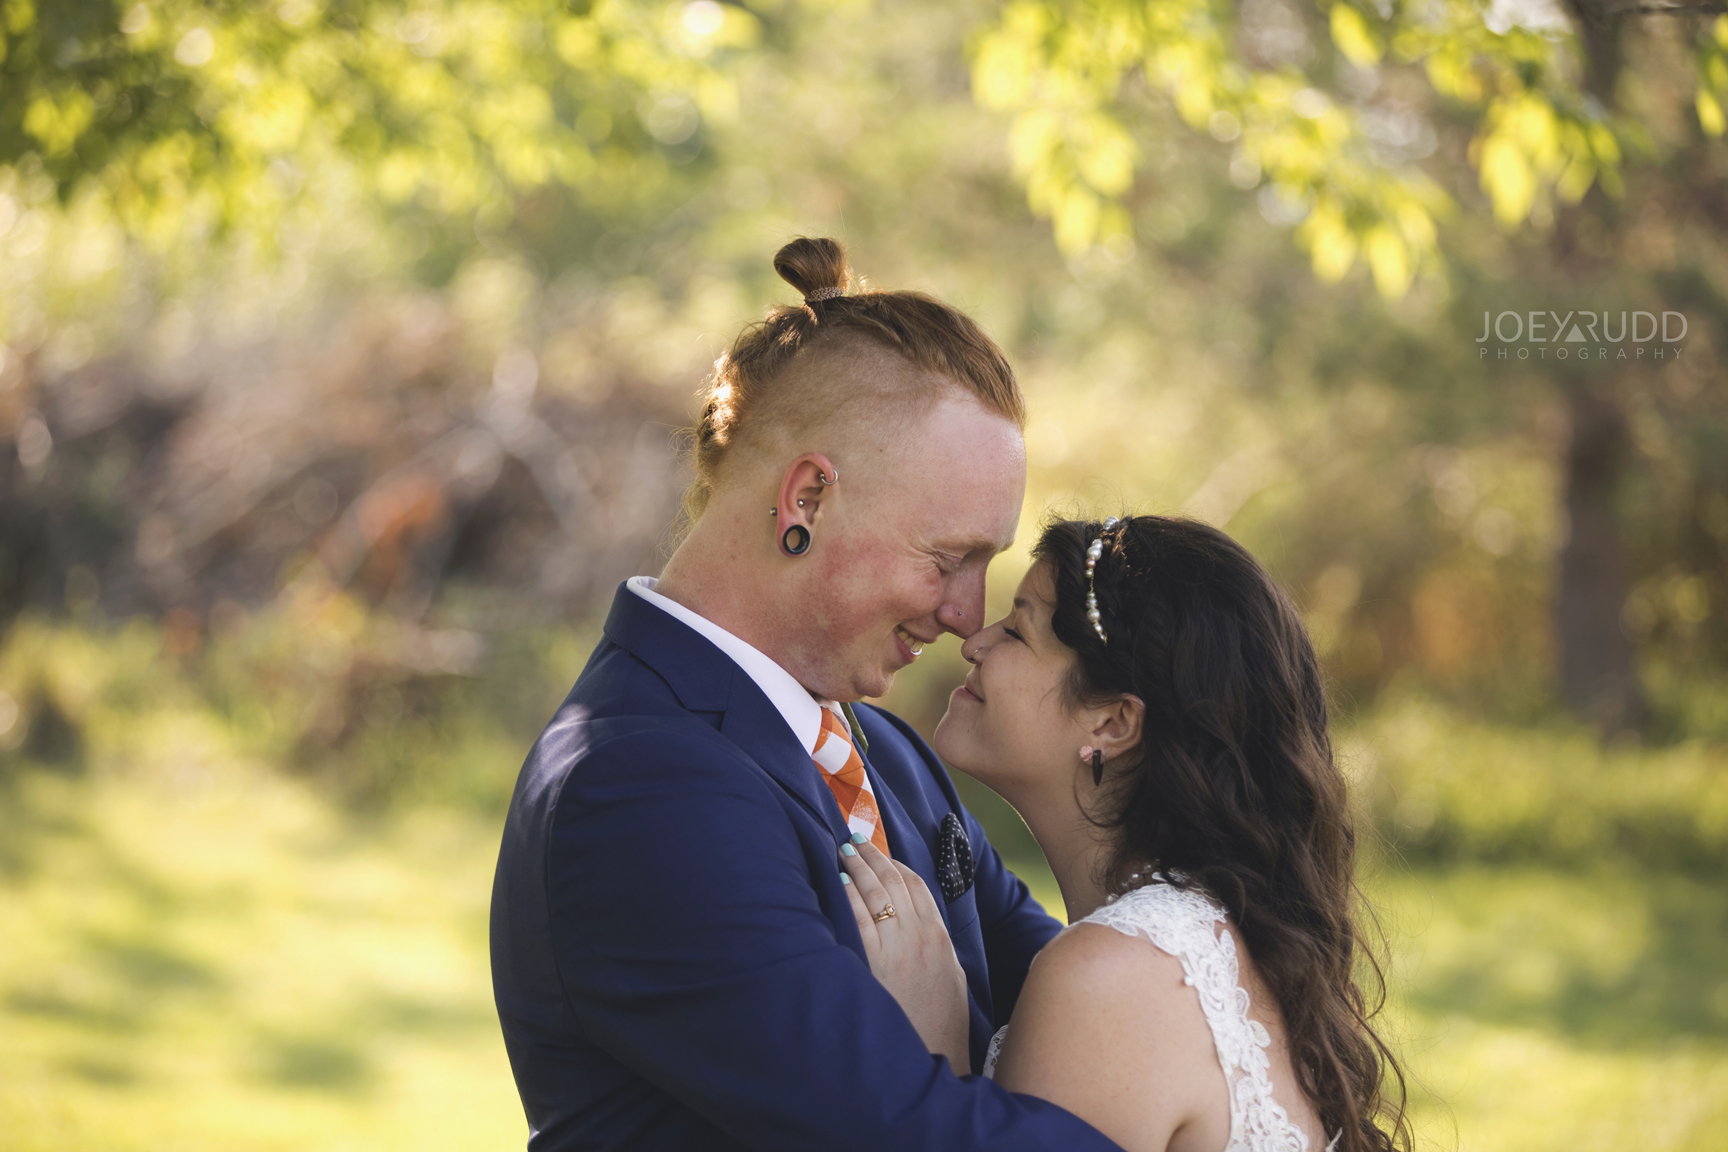 Backyard Kingston Wedding by Ottawa Wedding Photographer Joey Rudd Photography Bride and Groom Lovely